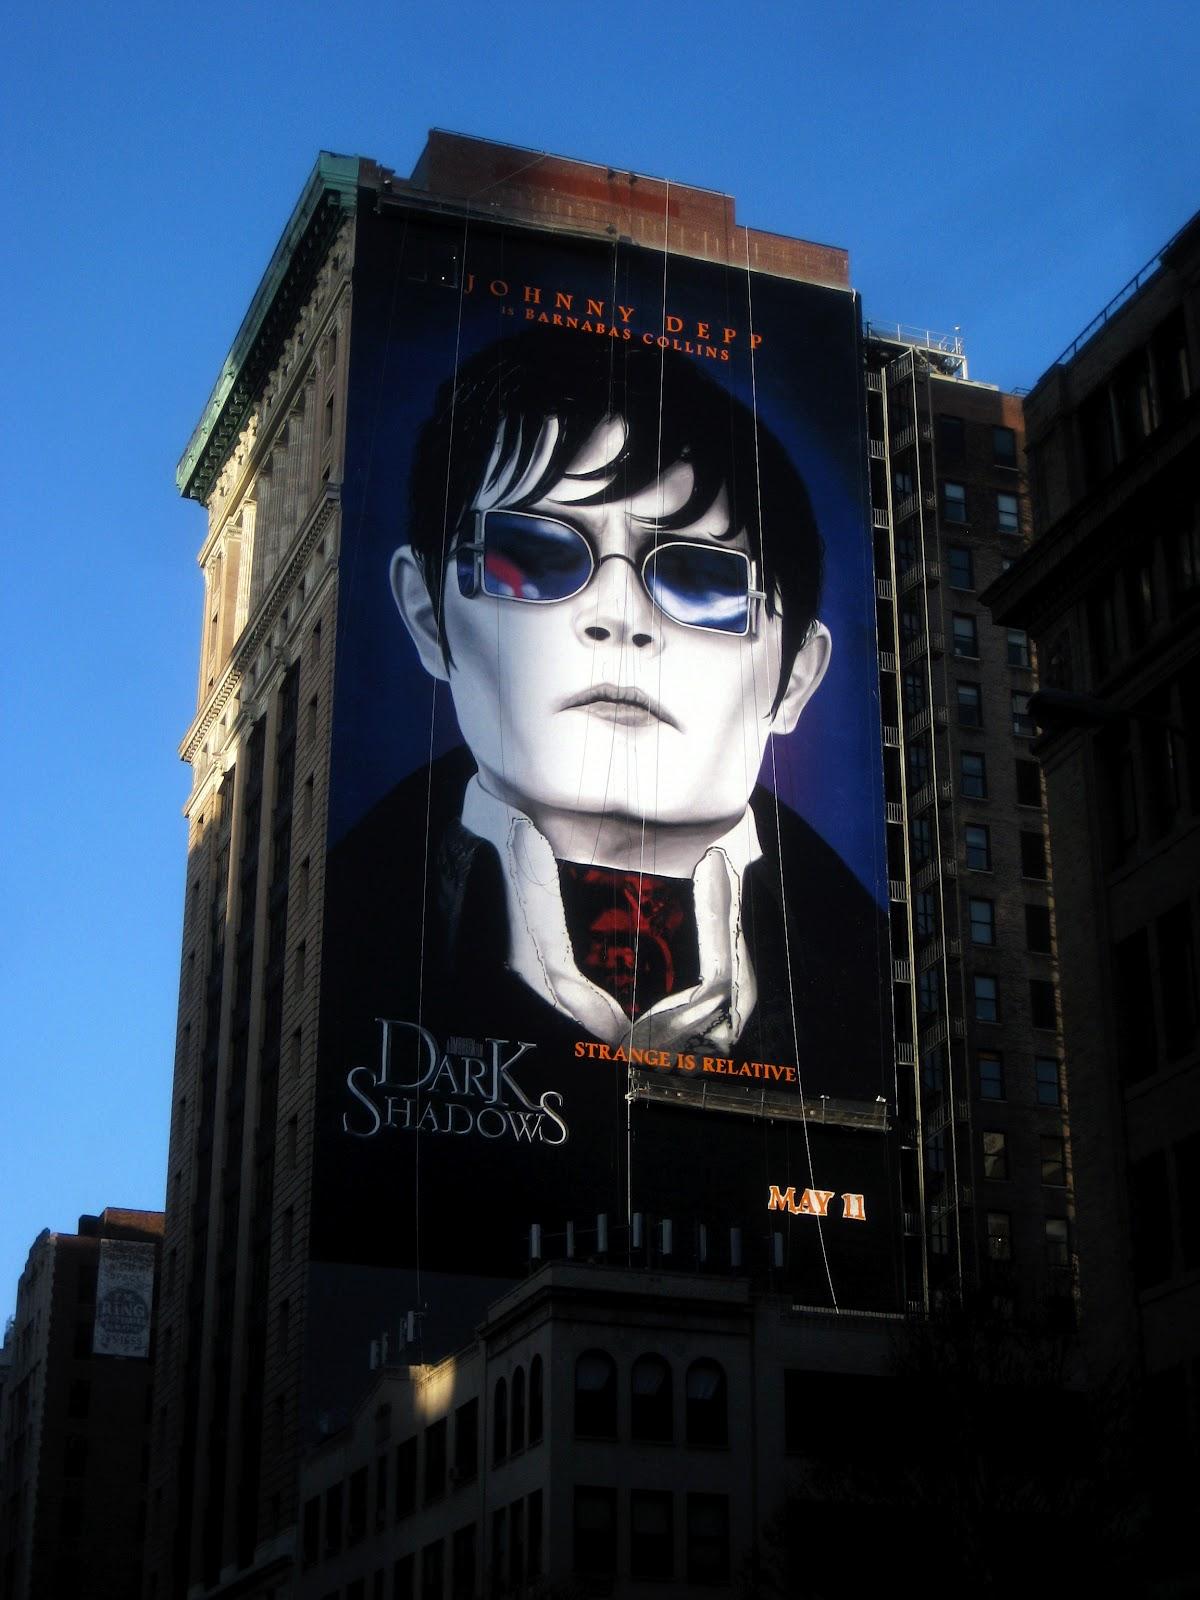 http://2.bp.blogspot.com/-m0U-_GZEZR8/T9VoKiMk9EI/AAAAAAAAGsc/D4Xu0L0U6mg/s1600/Dark-Shadows-2012-Johnny-Depp+movie+review+phistars+poster.jpg